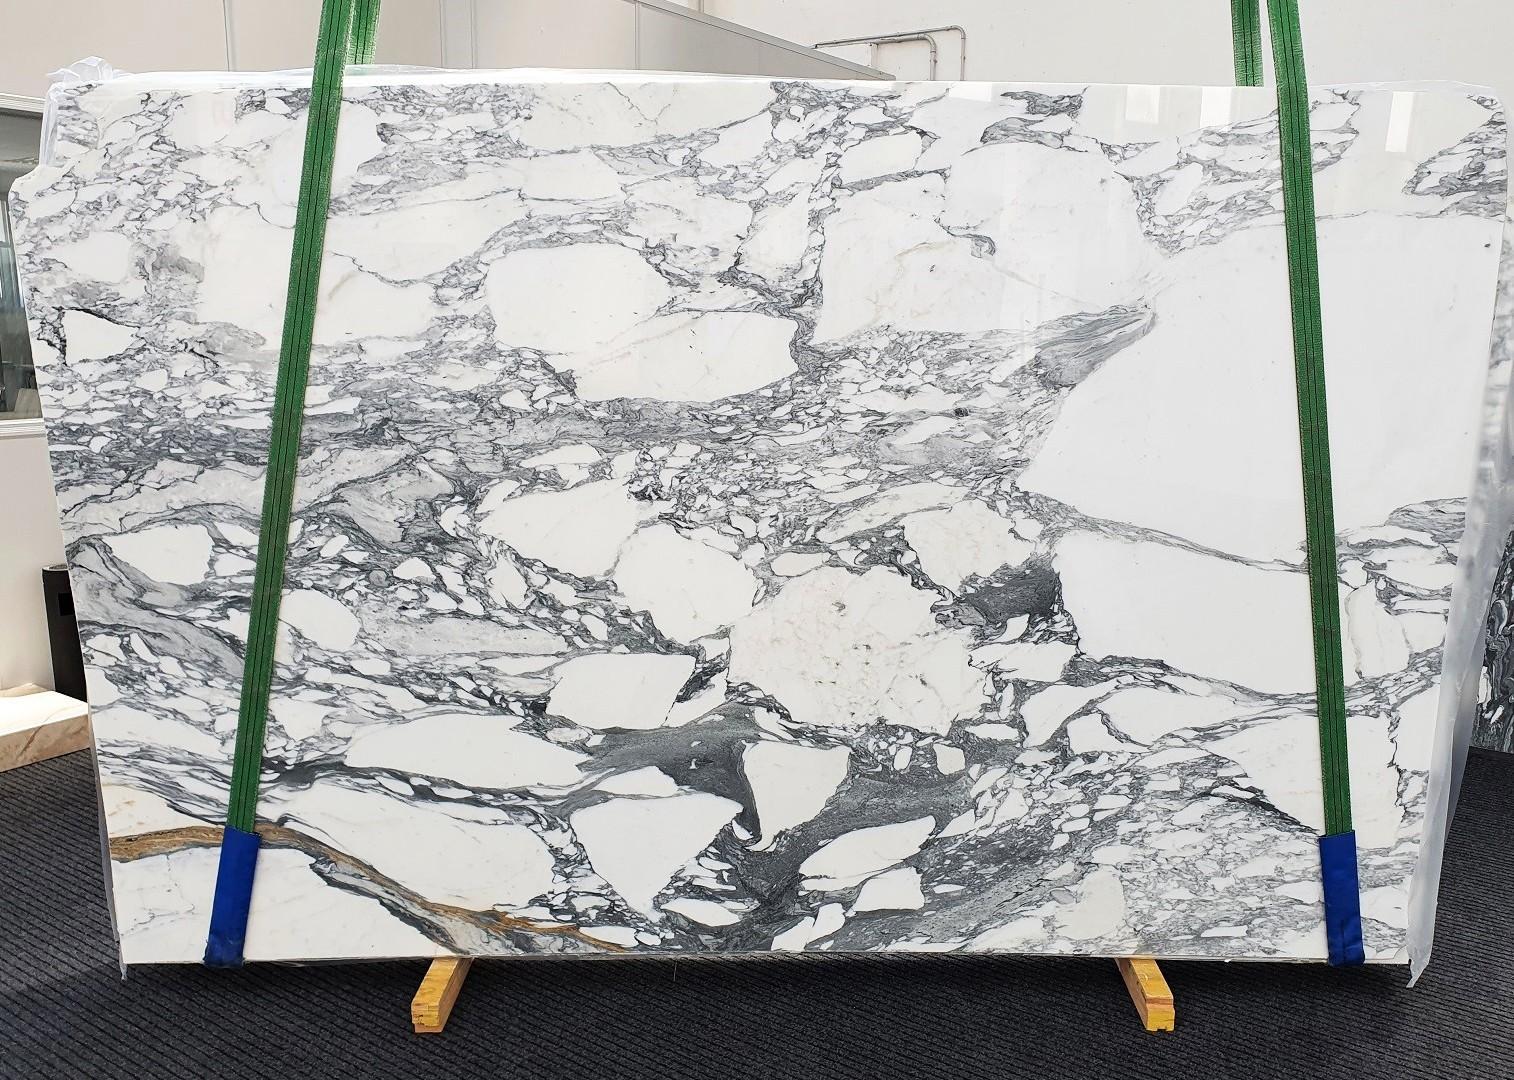 ARABESCATO CORCHIA Supply Veneto (Italy) polished slabs 1433 , Slab #09 natural marble